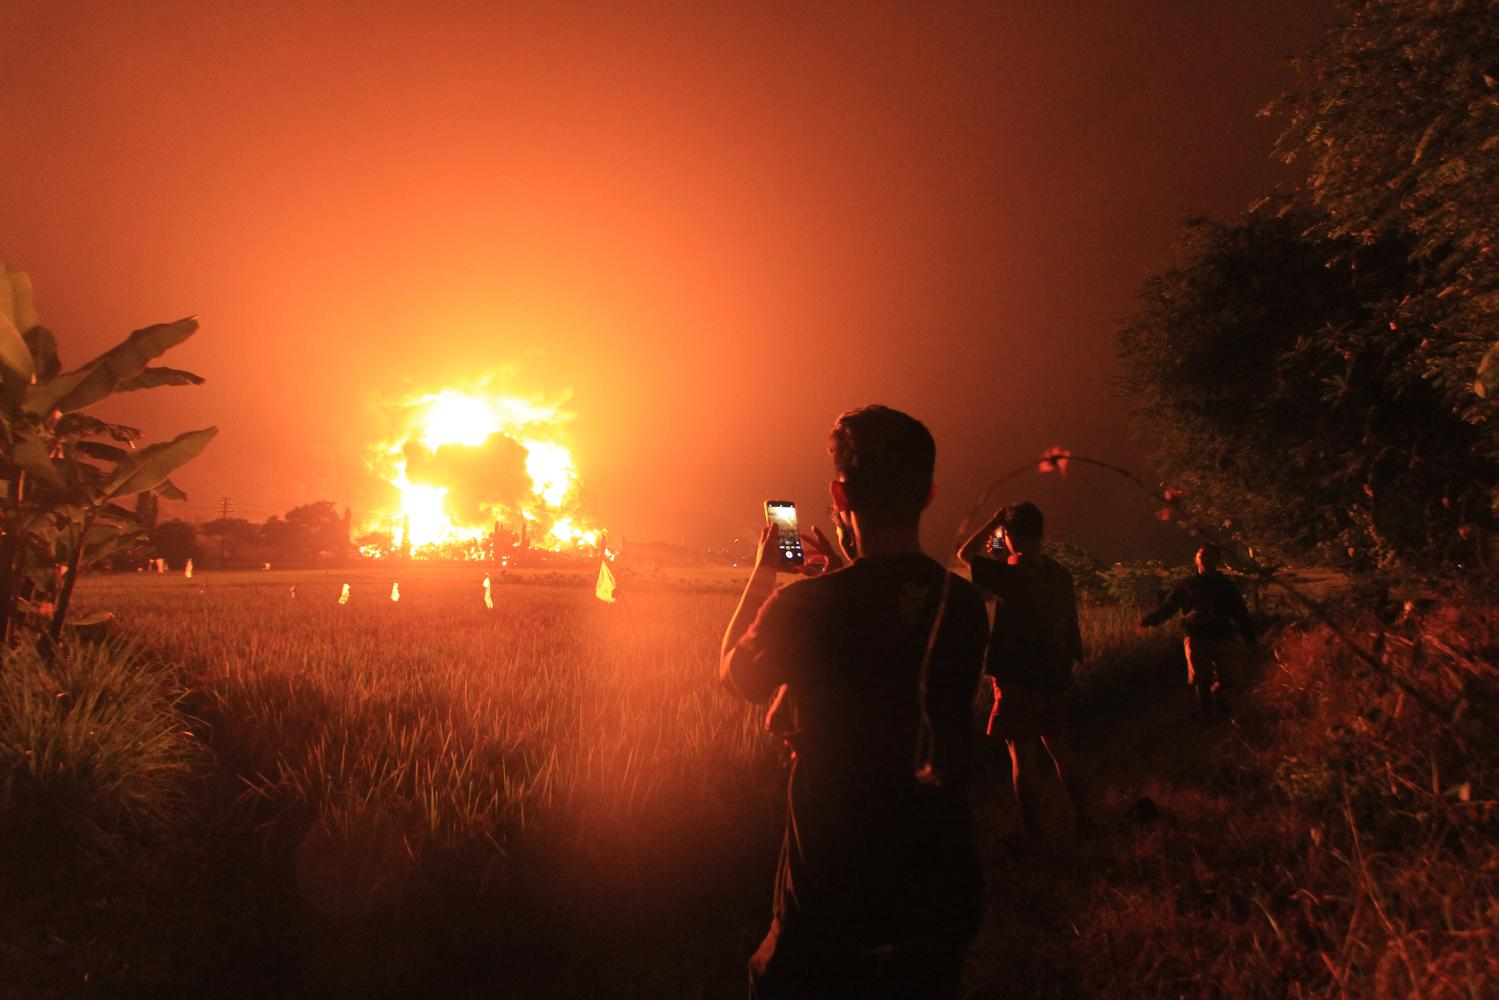 Warga menyaksikan kebakaran di kompleks Pertamina RU VI Balongan, Indramayu, Jawa Barat, Senin (29/3/2021) dini hari.